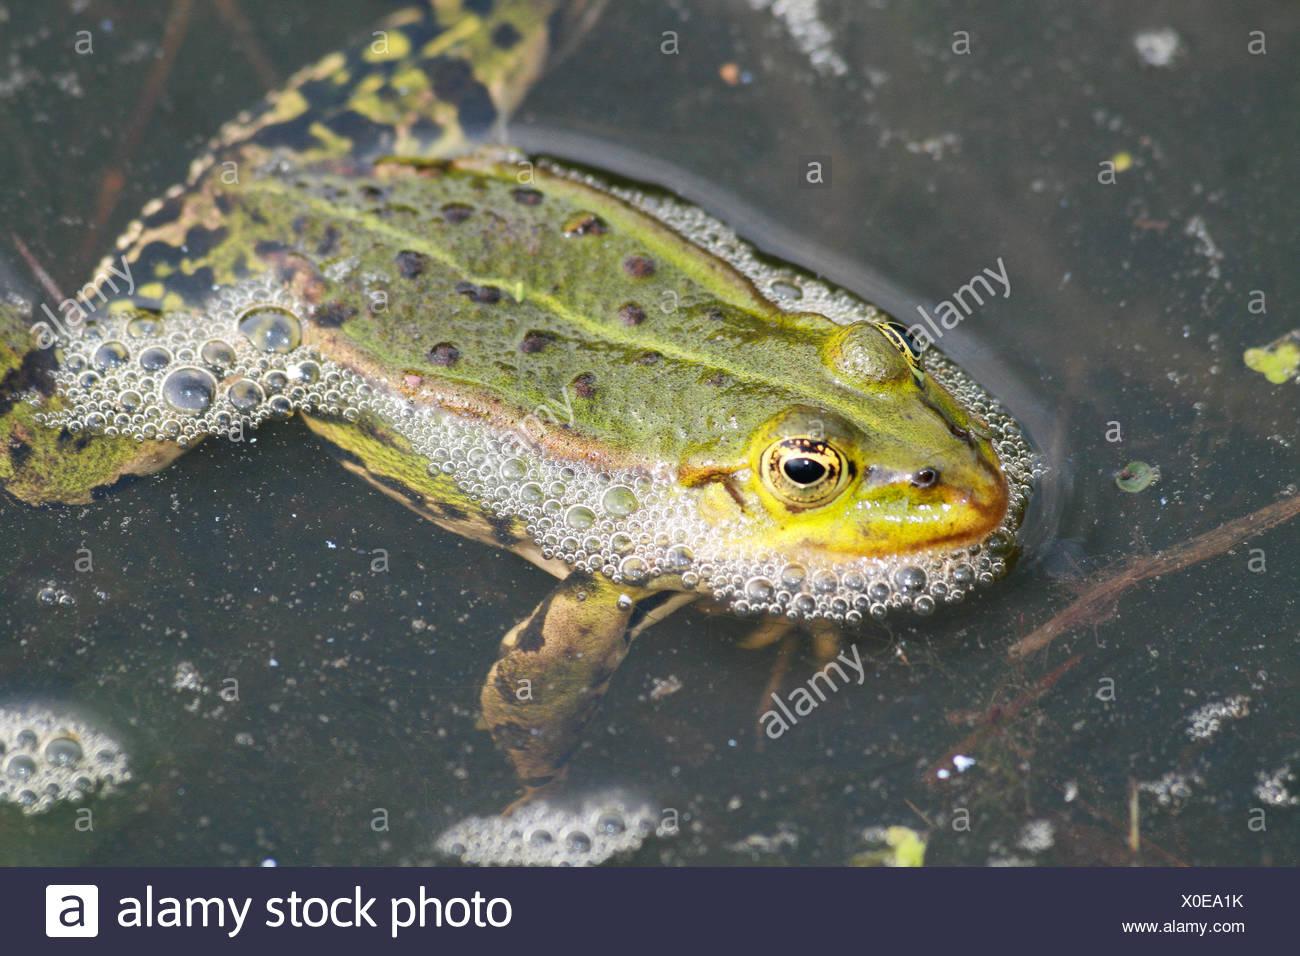 Close-up of a frog, Enschede, Overijssel, Holland - Stock Image